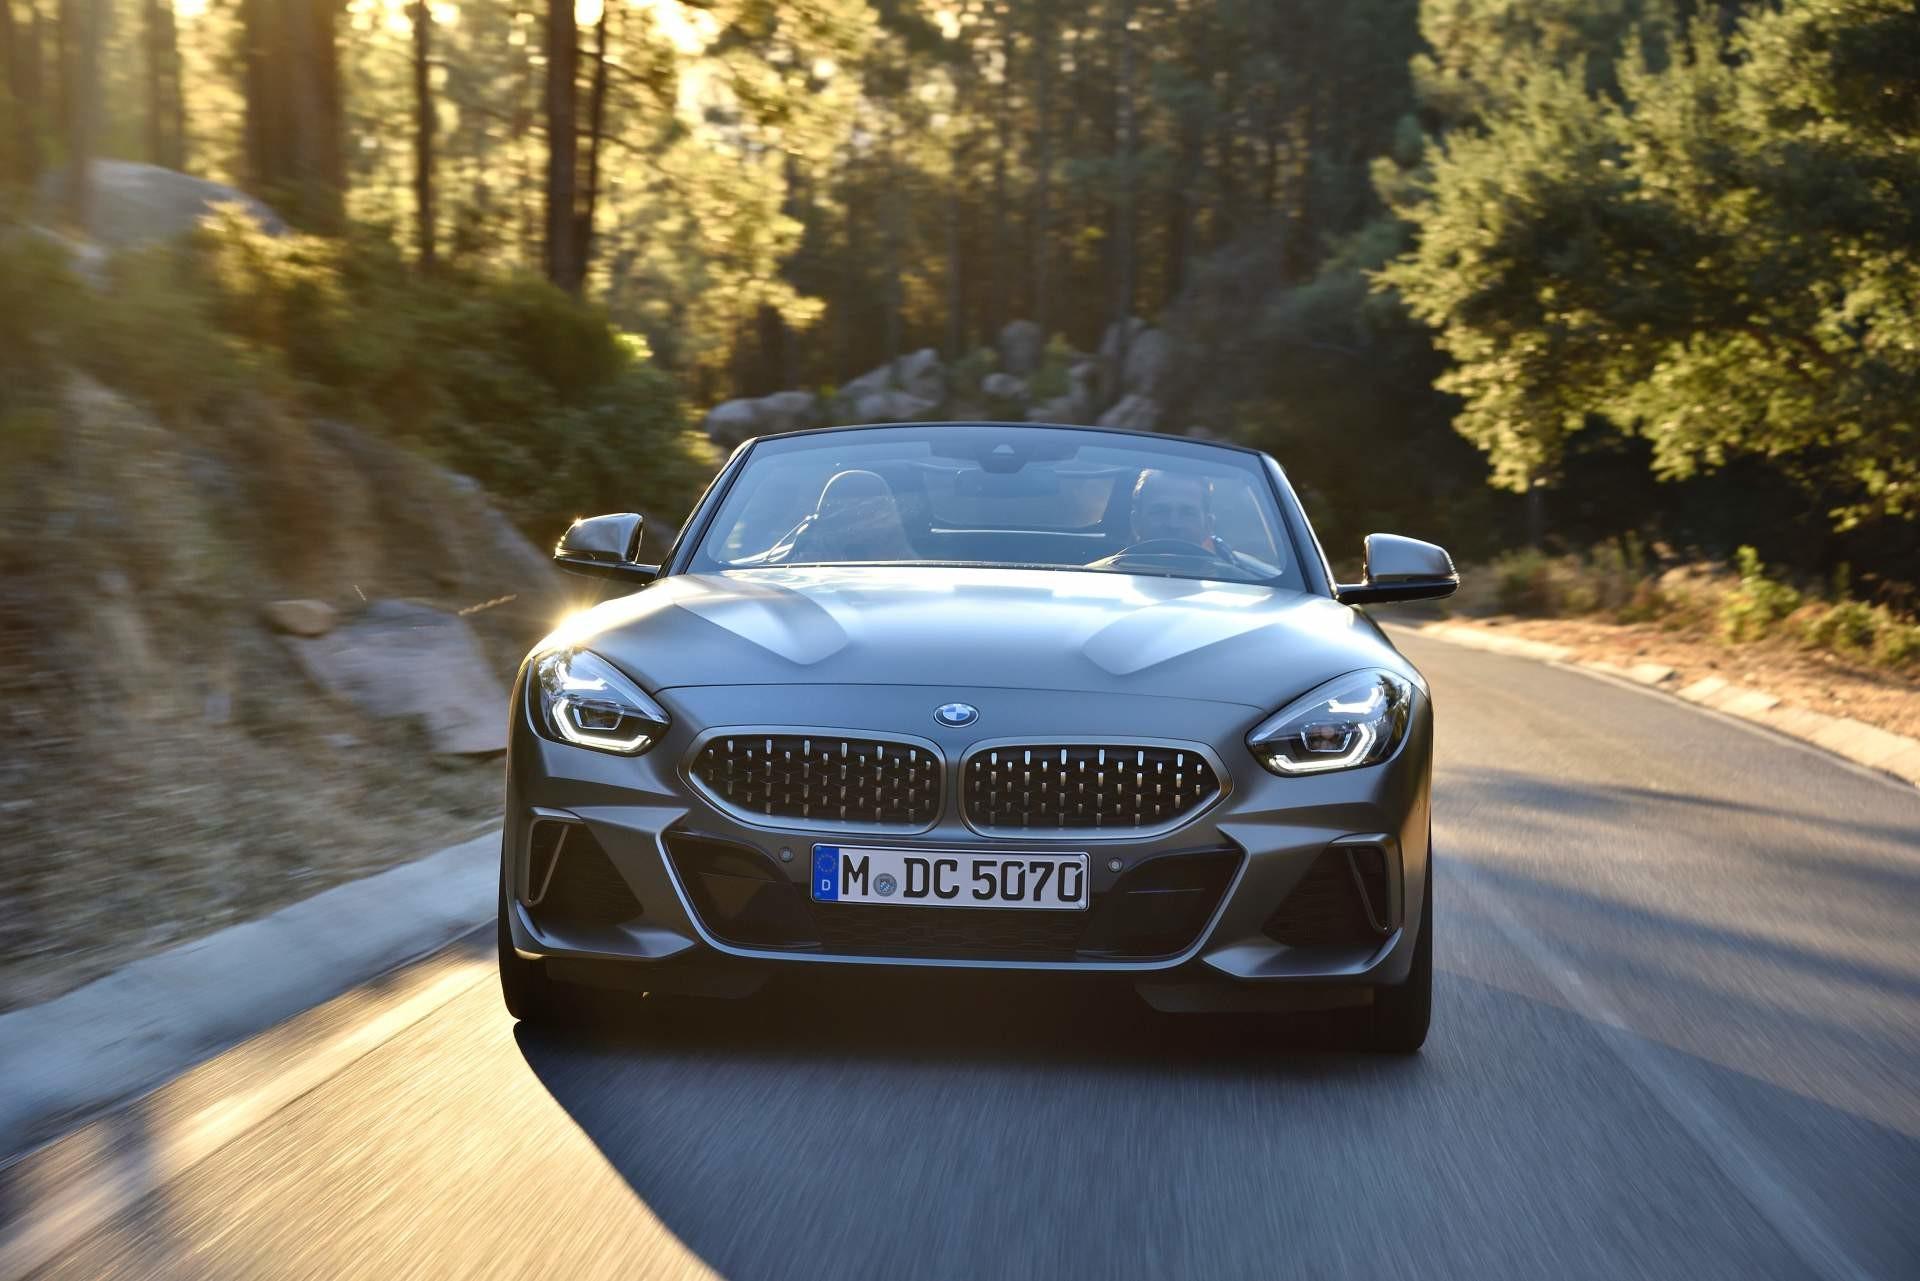 Foto de BMW Z4 M40i 2019 (19/84)